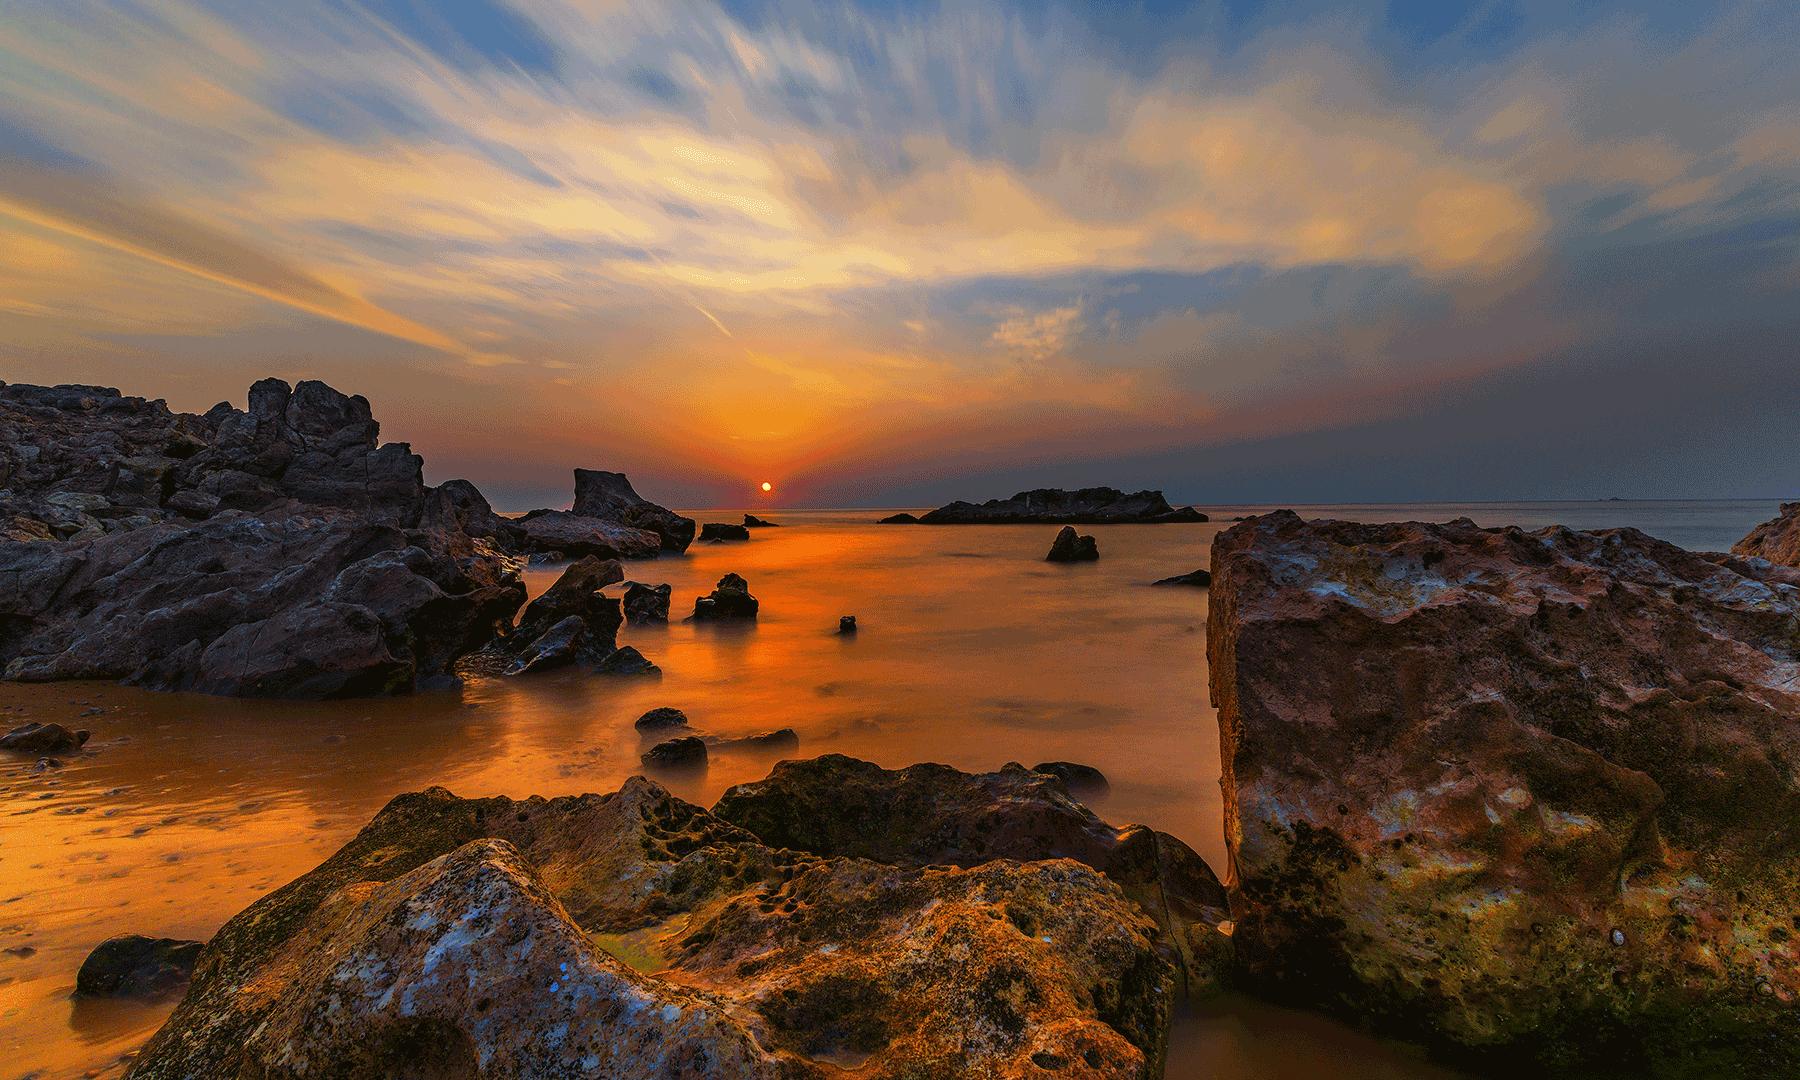 Gaddani's coast - Syed Mahdi Bukhari